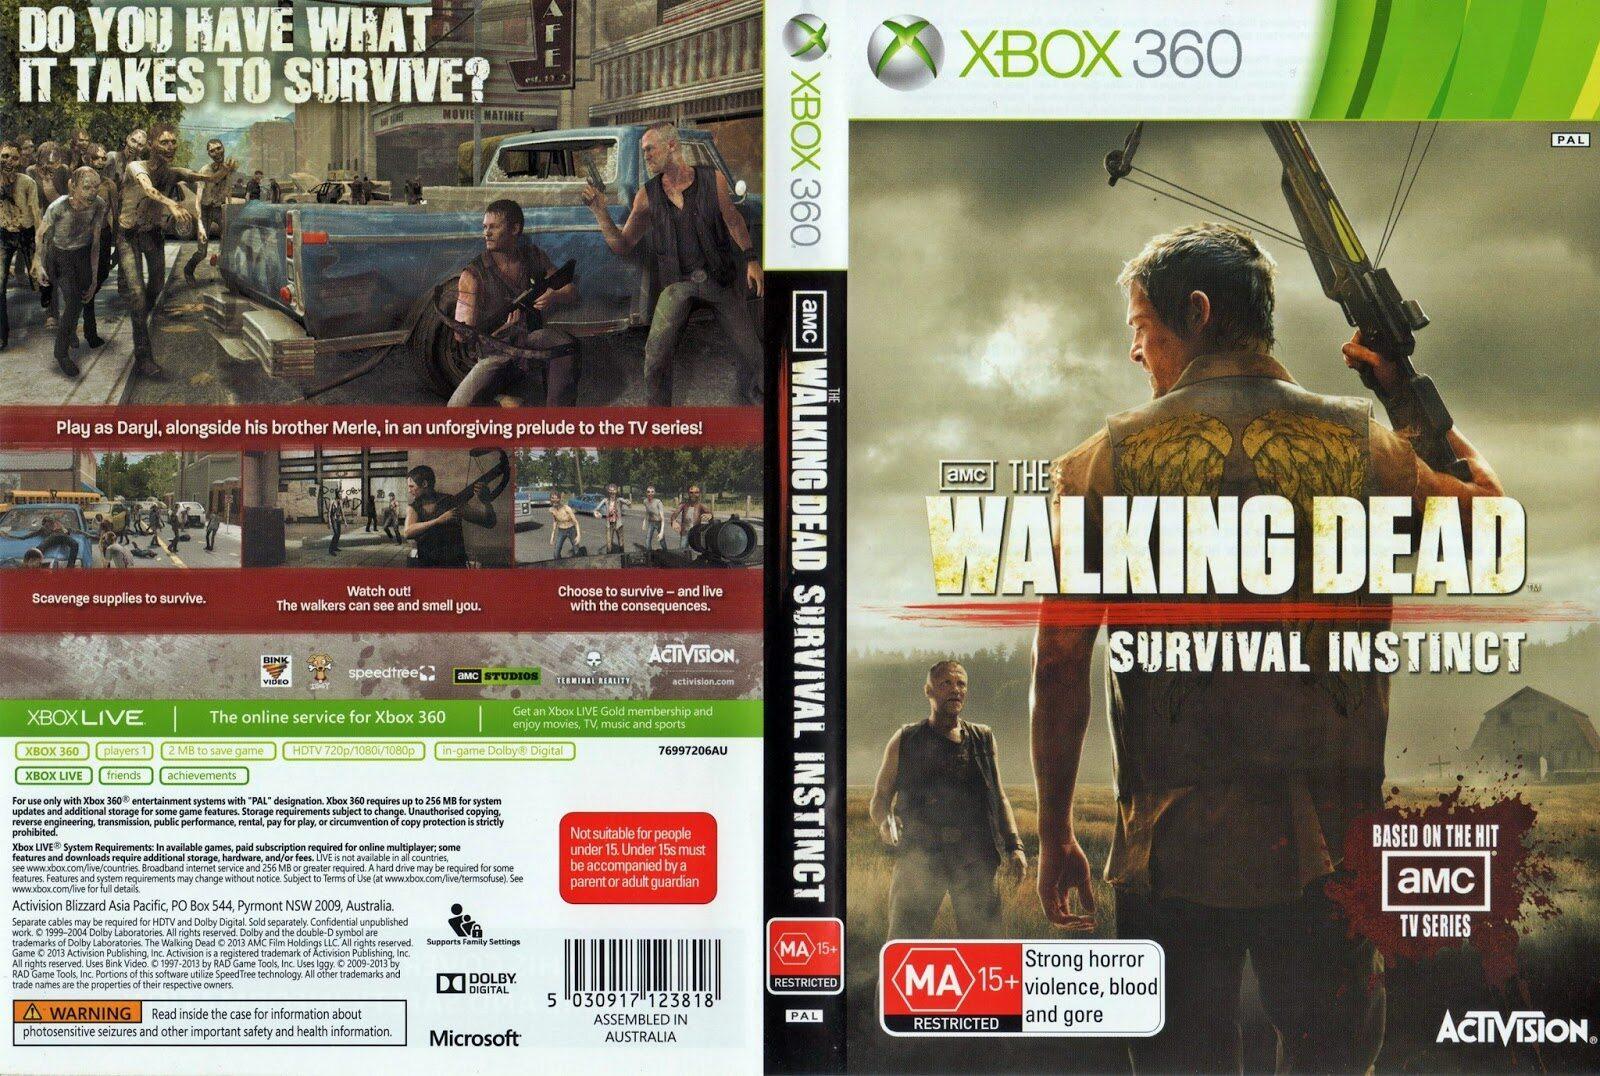 XBOX 360 The Walking Dead Survival Instinct